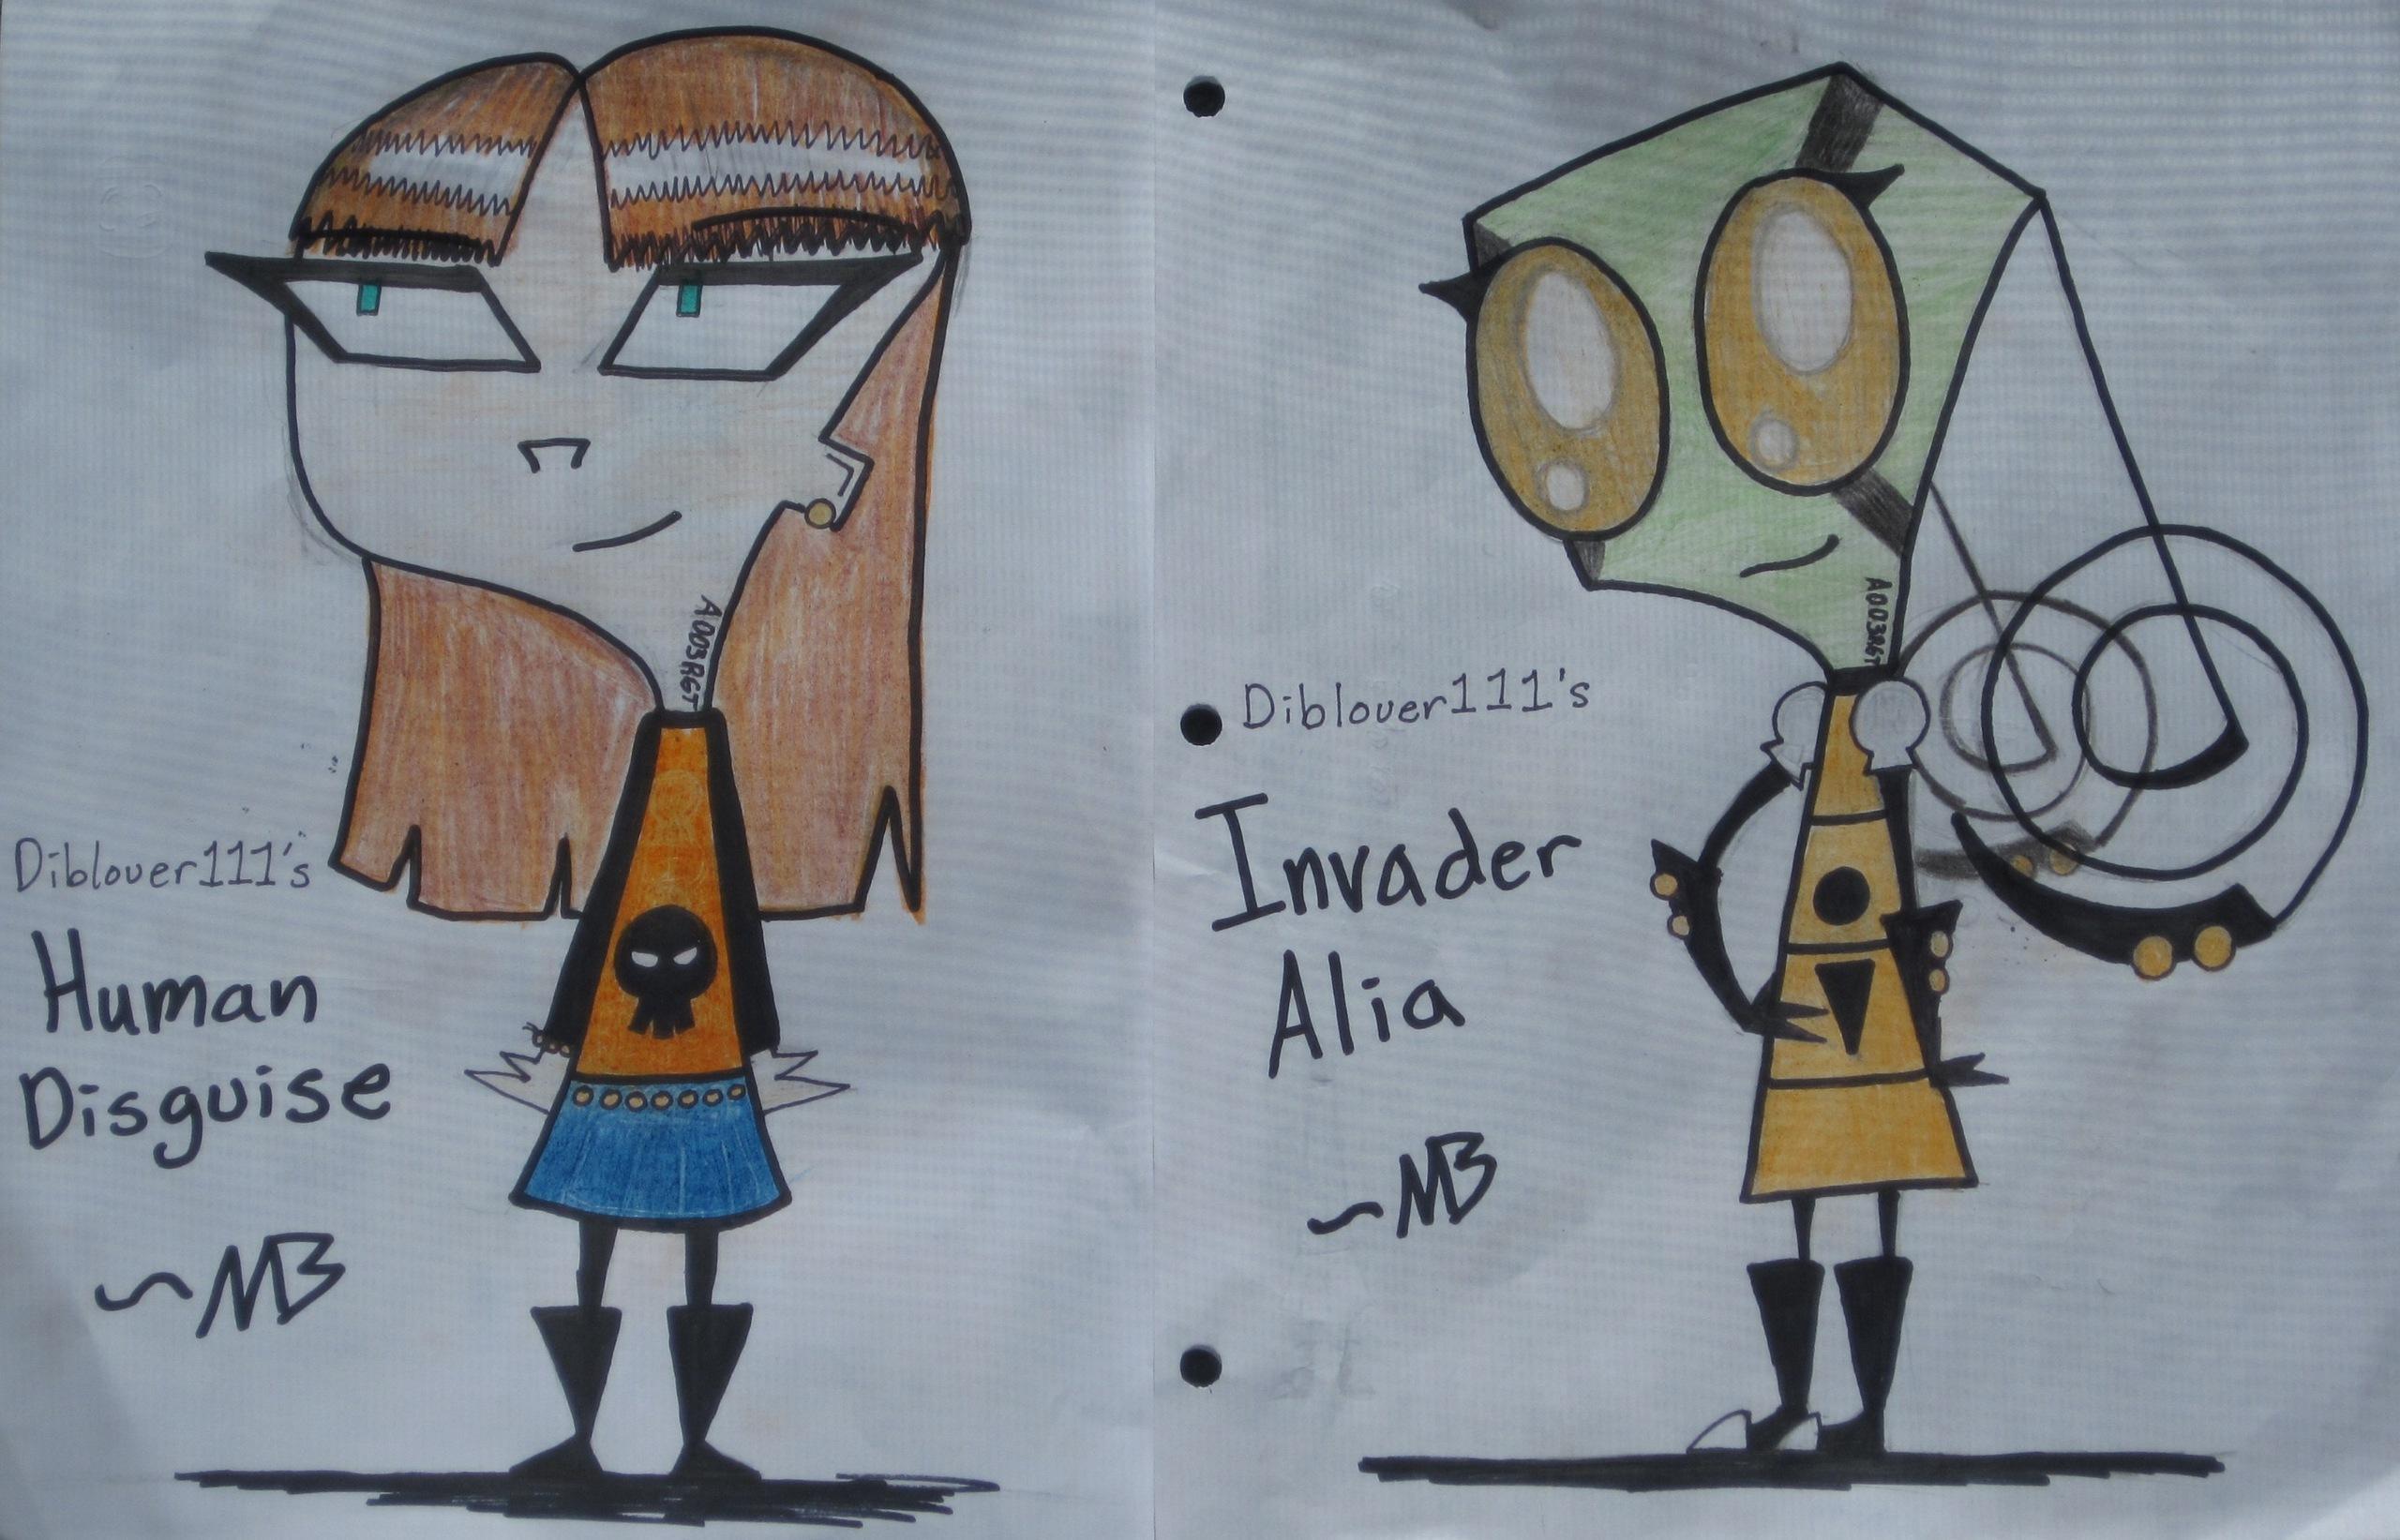 Invader Alia contest!